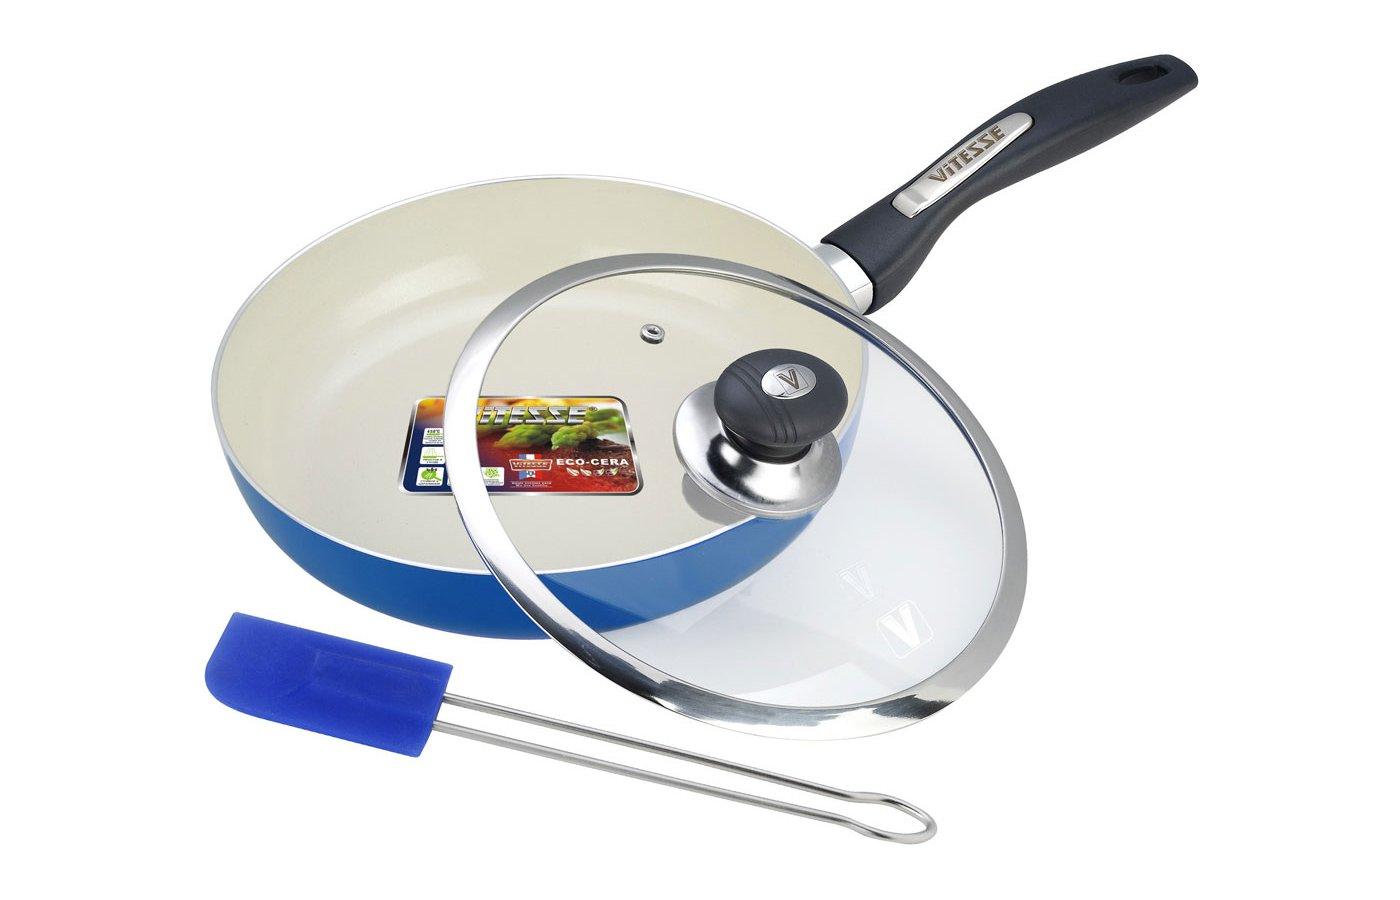 Сковорода VITESSE VS-2201 Сков с крыш 24 см кер.покр